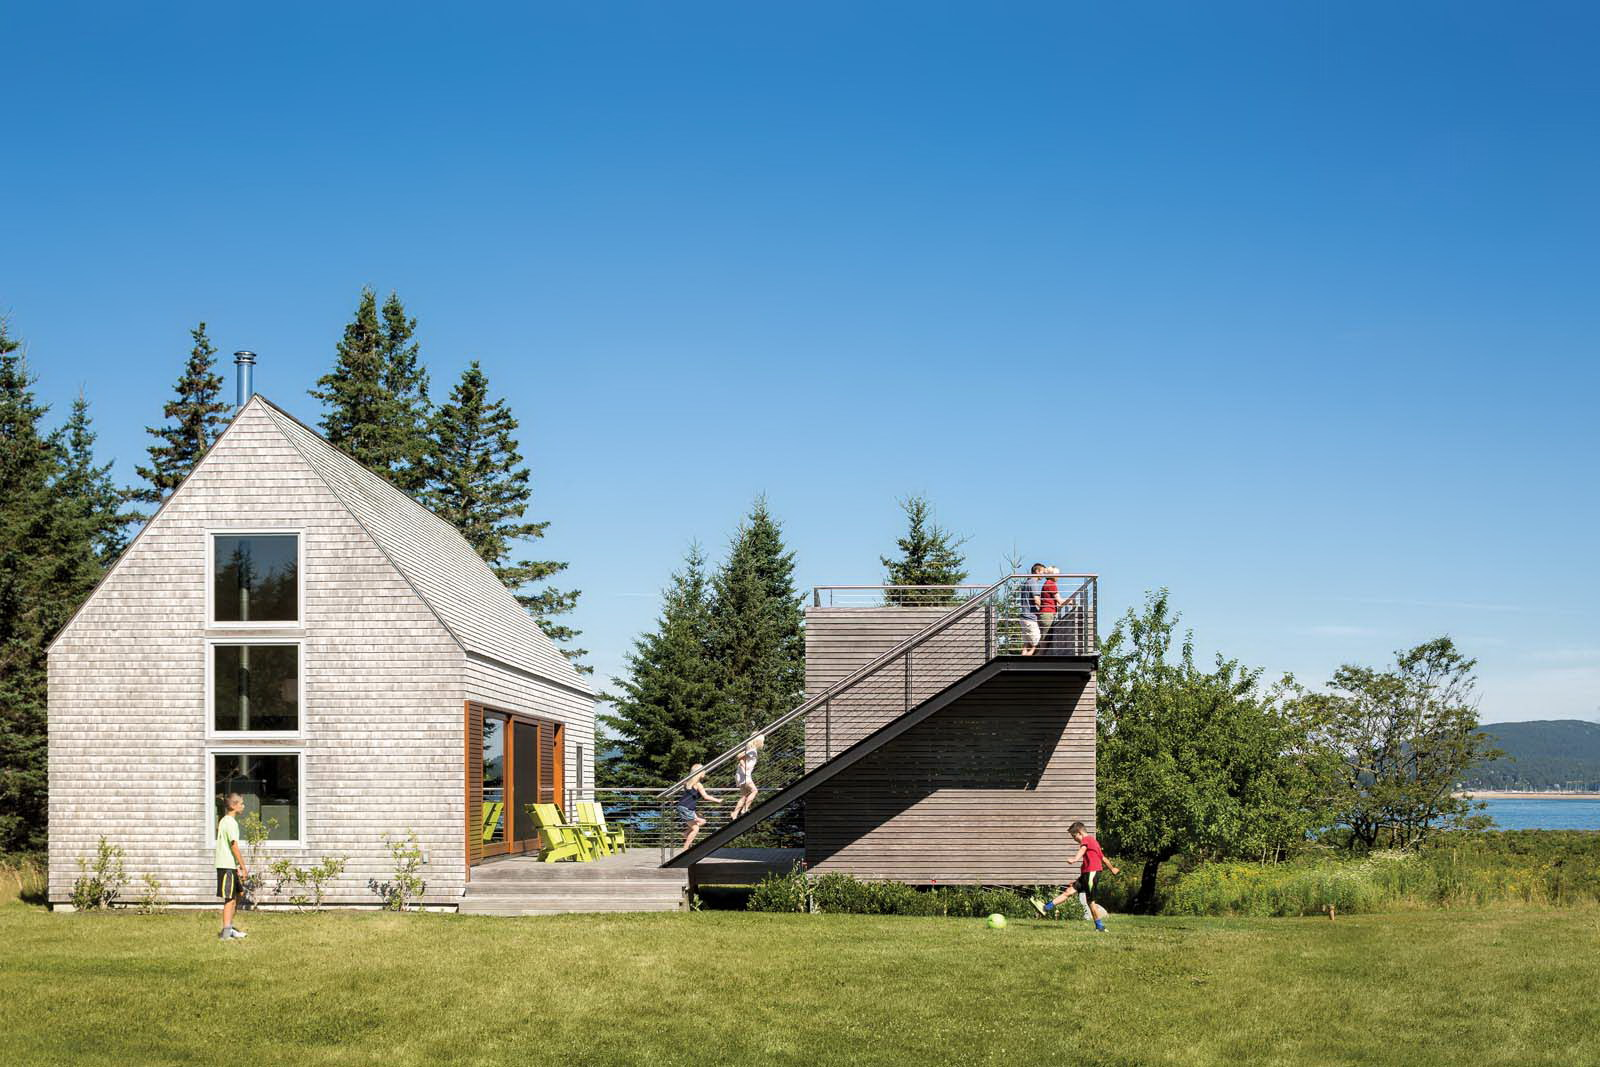 House on an Island by Elliott + Elliott Architecture